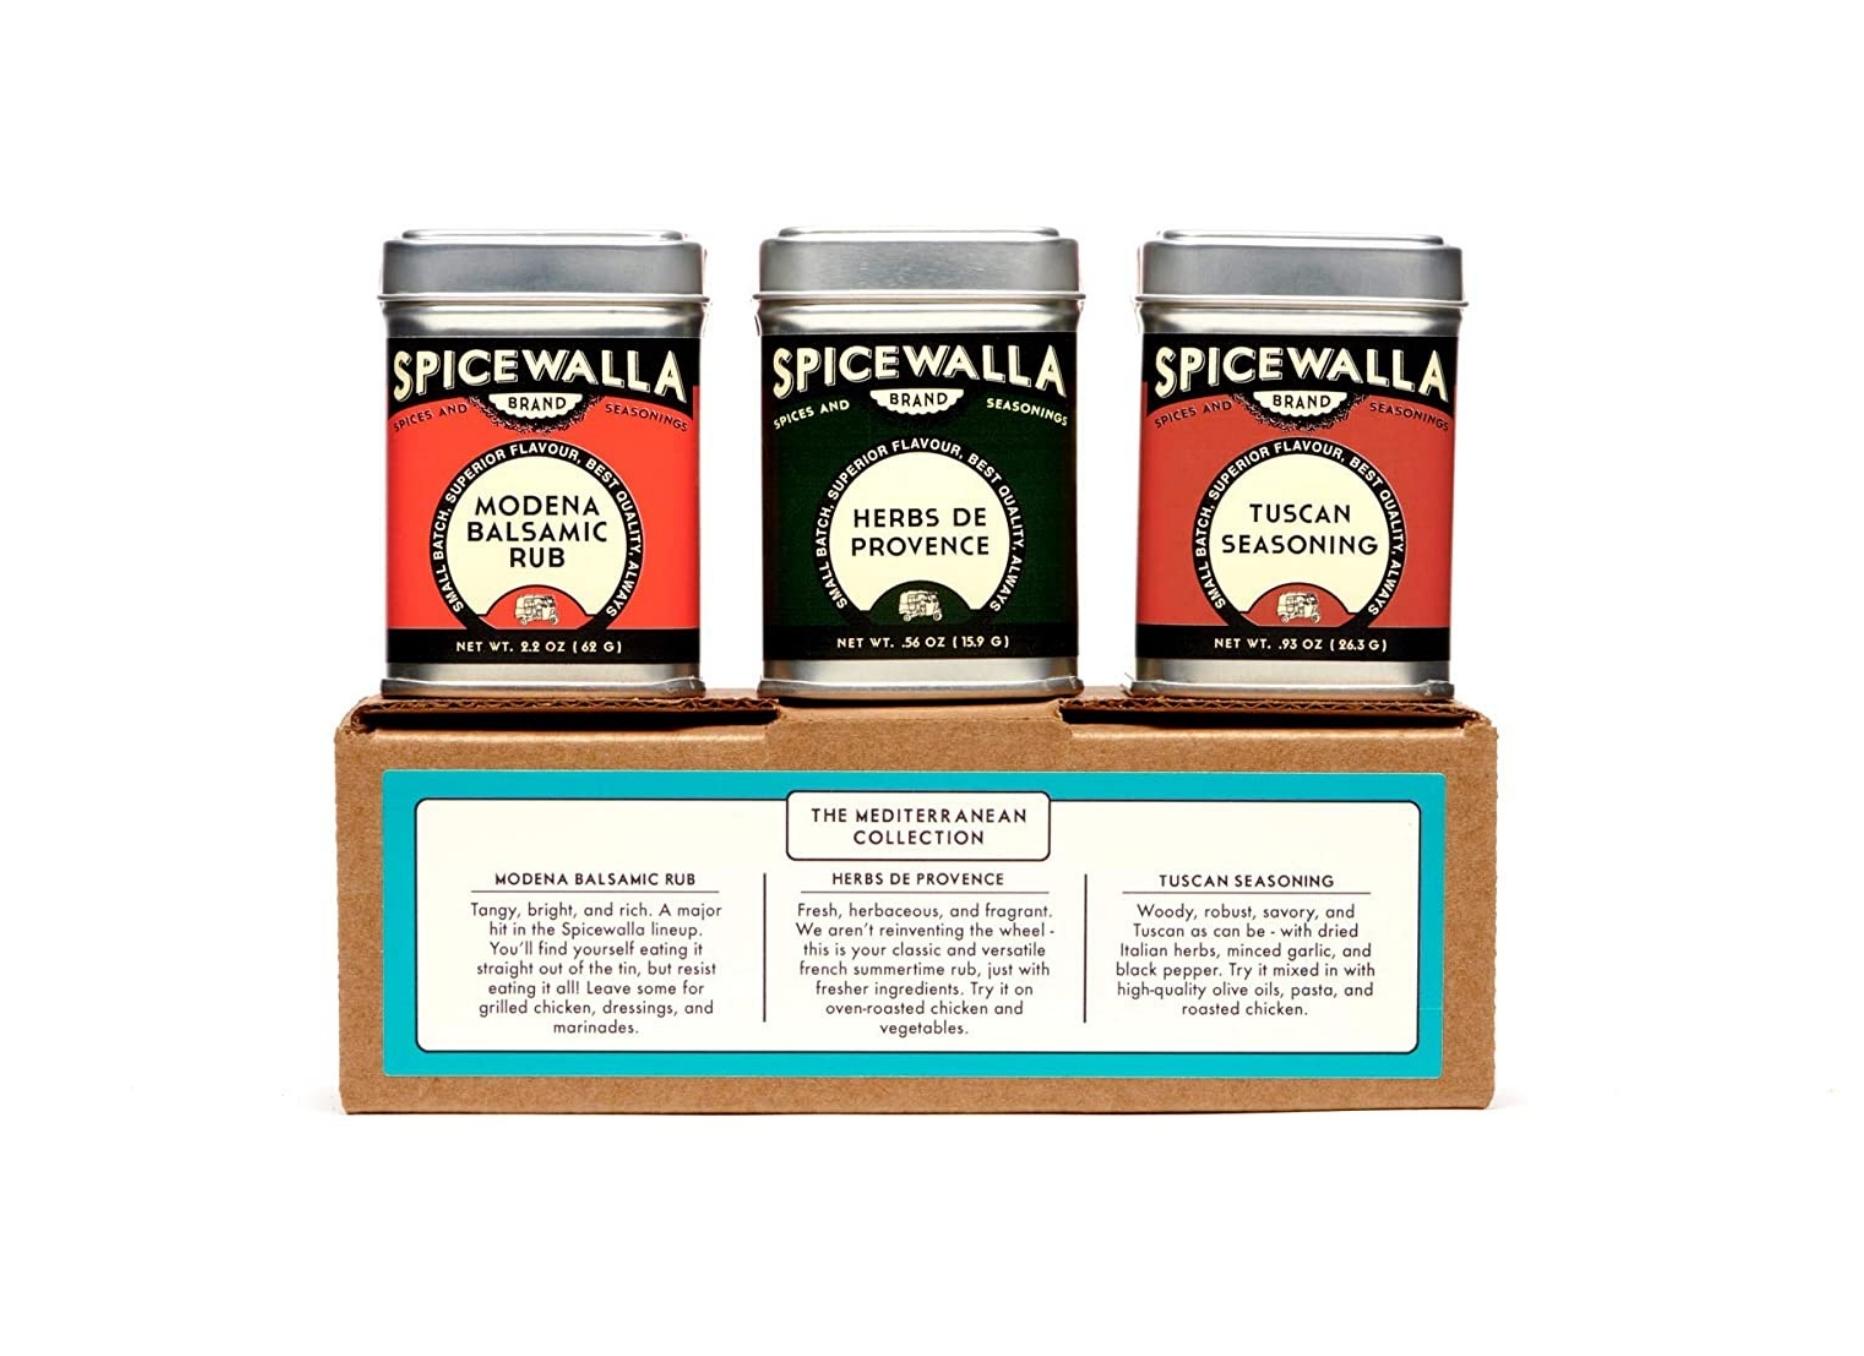 Spicewalla Spices